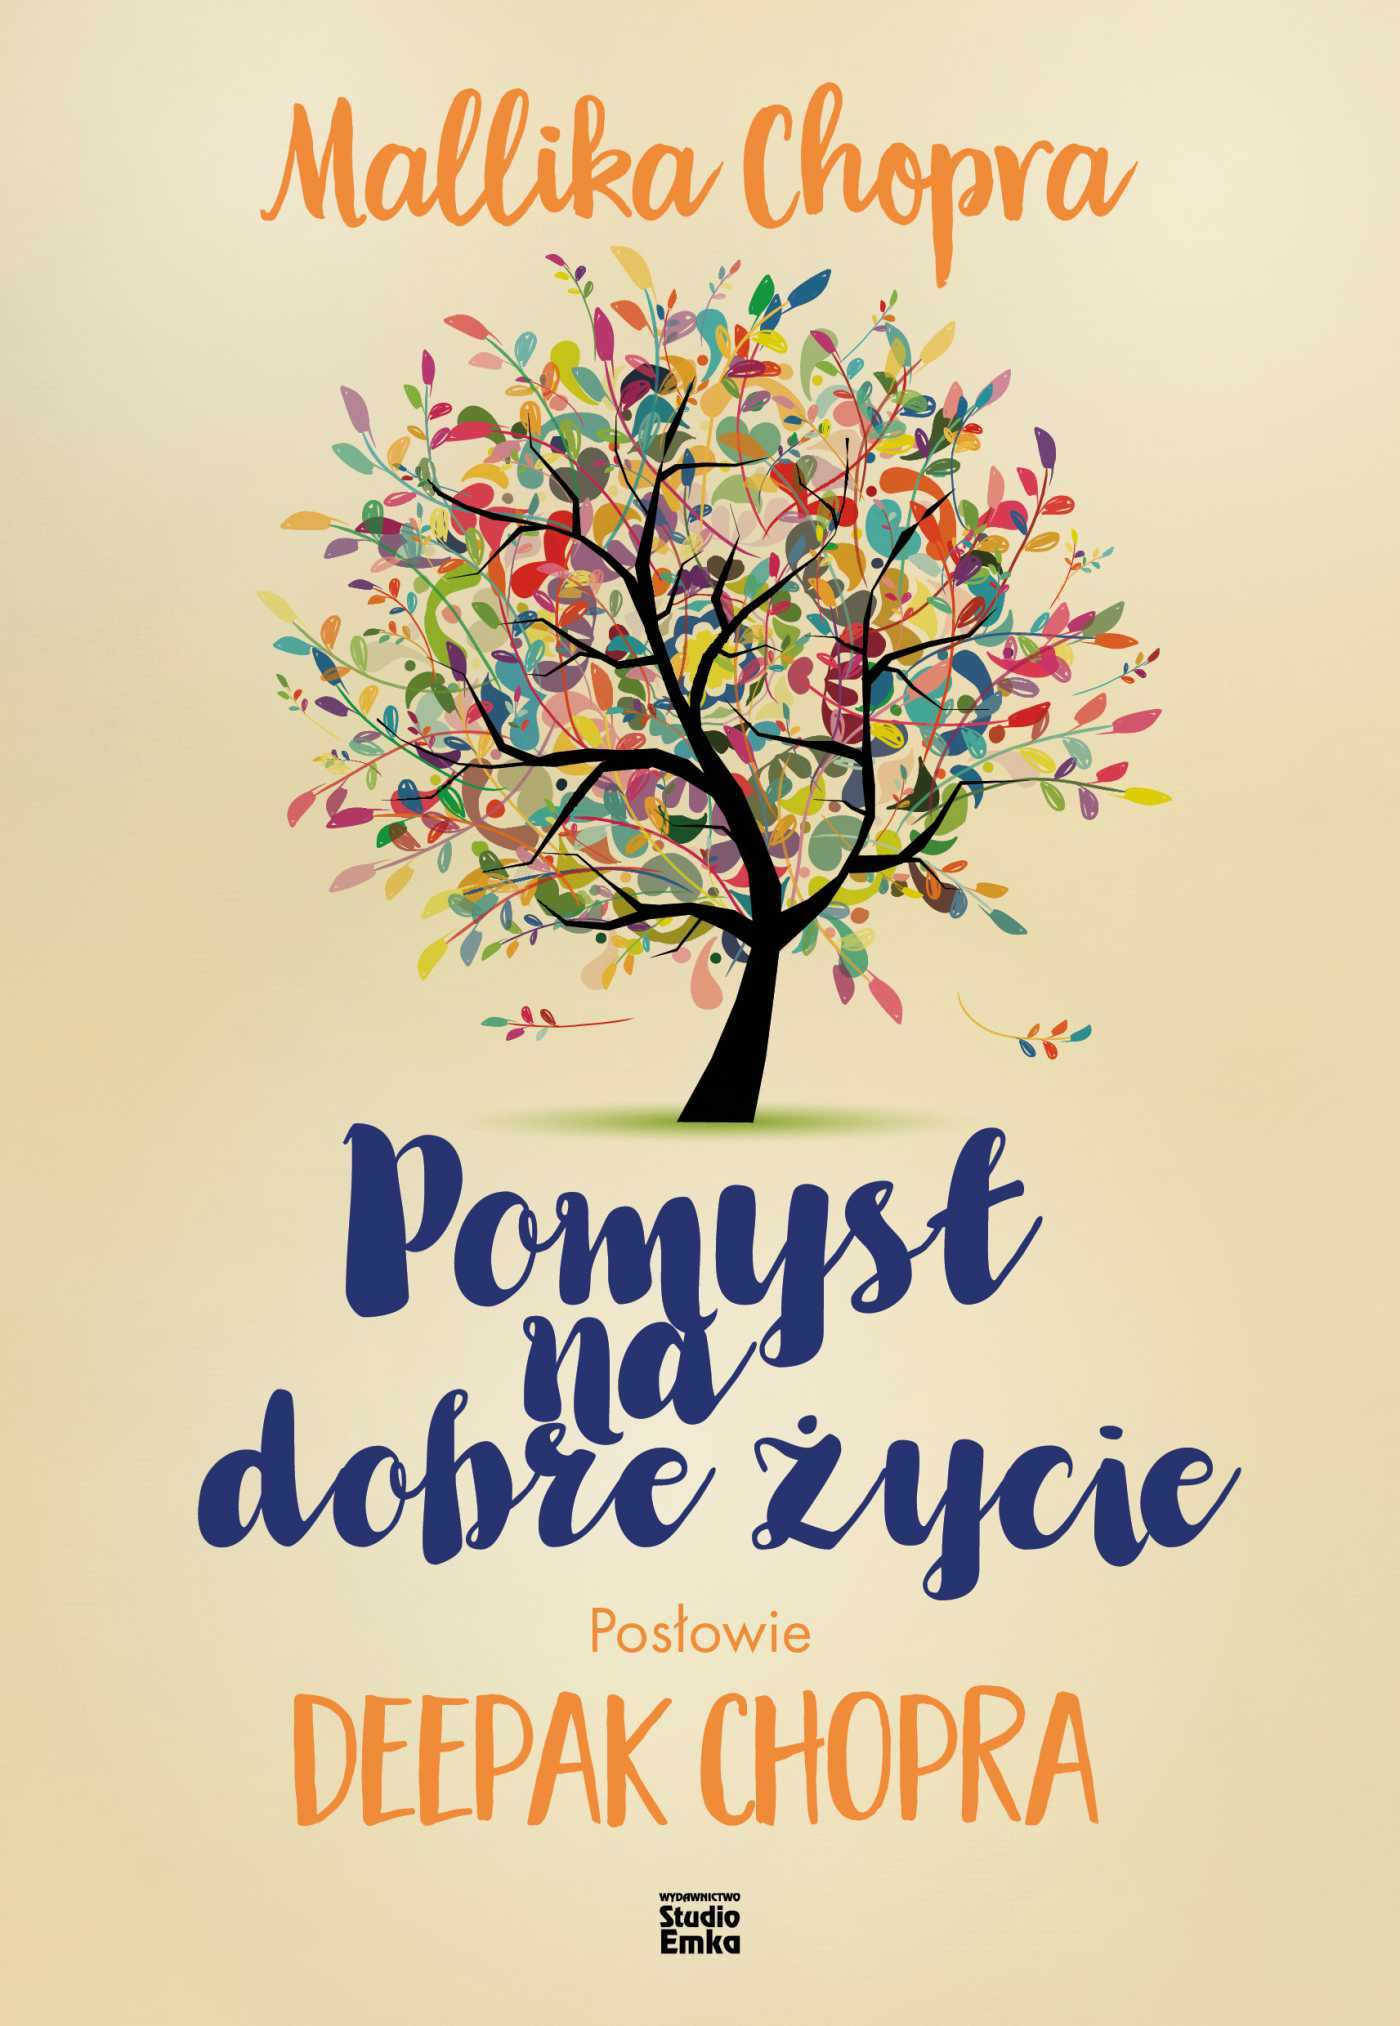 Pomysł na dobre życie - Ebook (Książka na Kindle) do pobrania w formacie MOBI